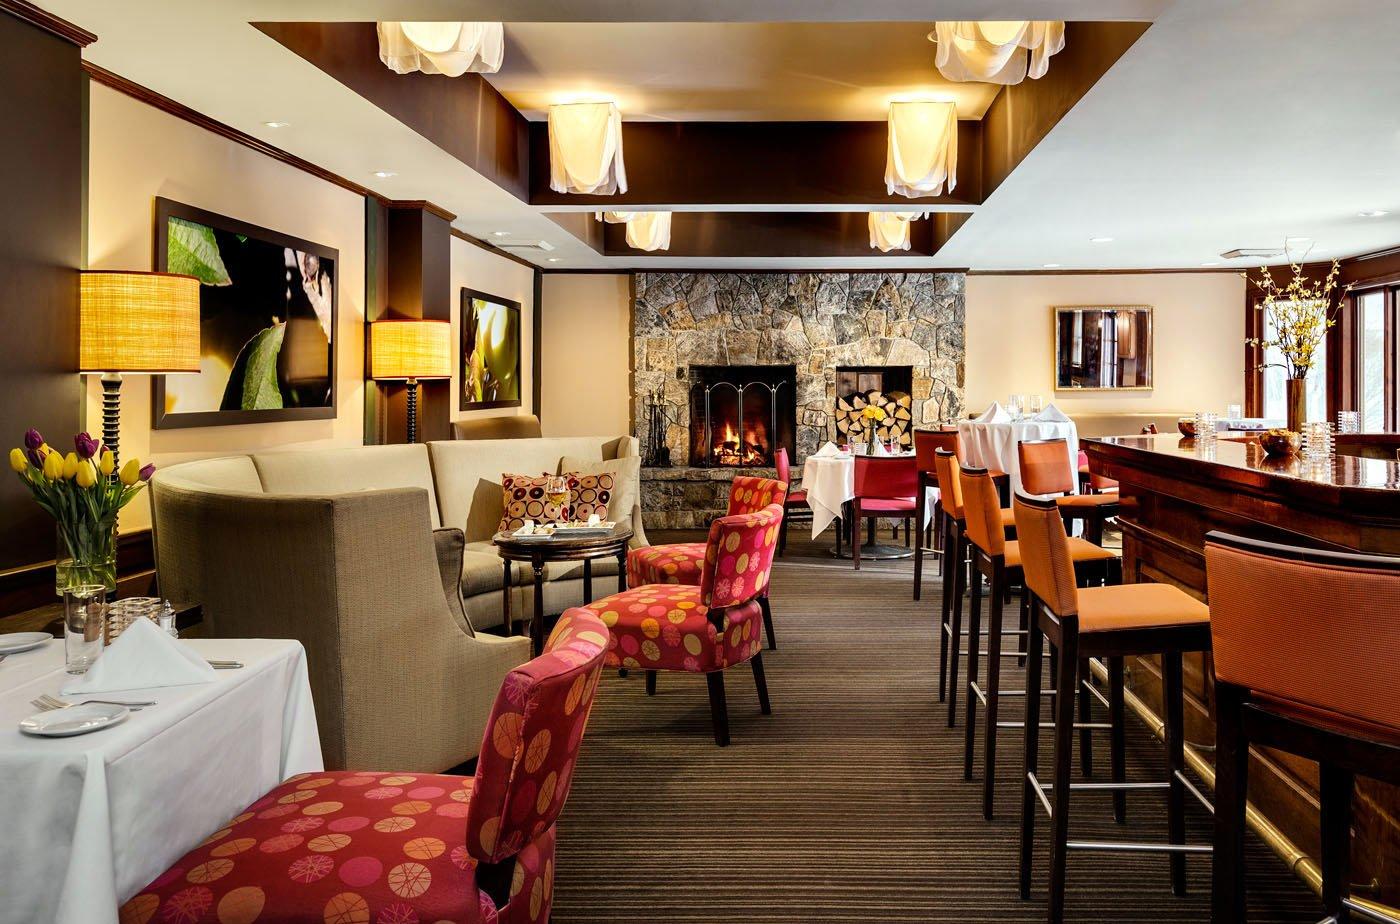 Gala Restaurant And Bar Destination Williamstown